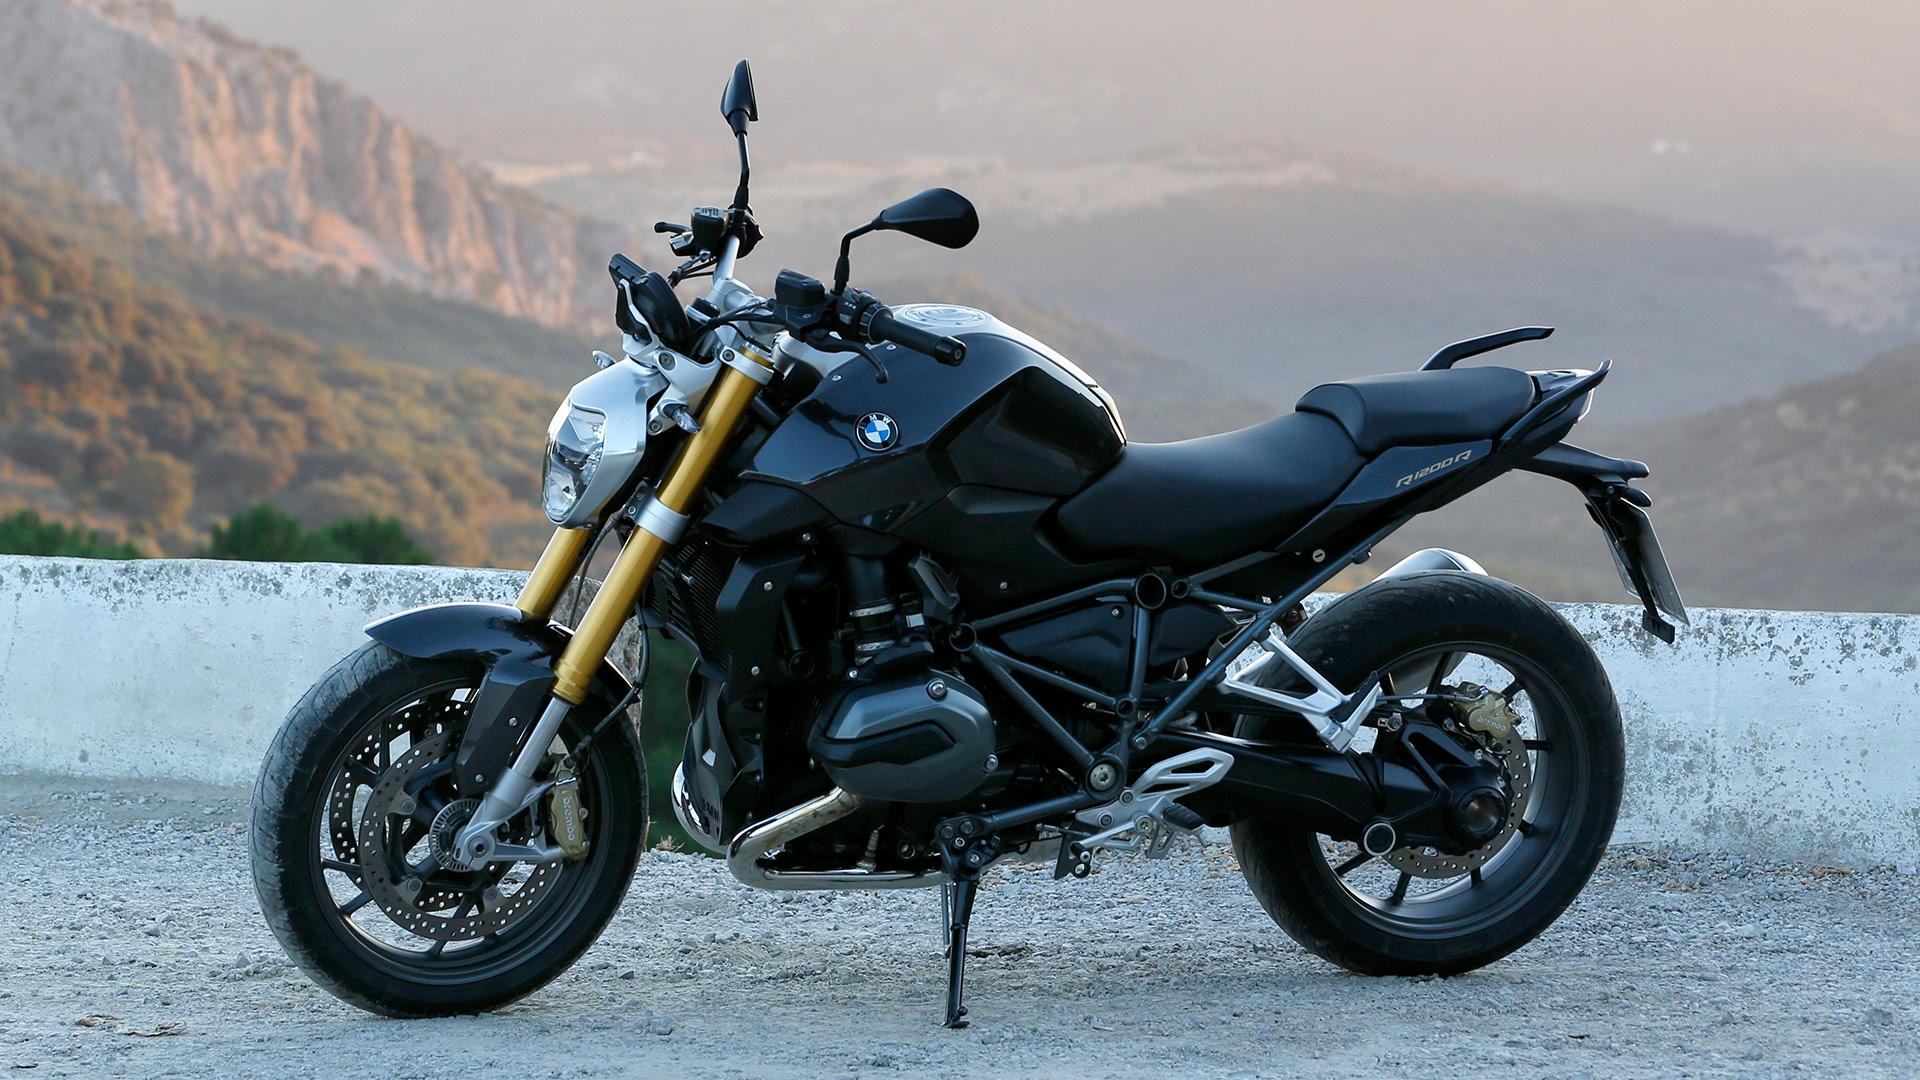 r1200r, bmw r1200r, bmw motorcycles, albesadv, albes adv